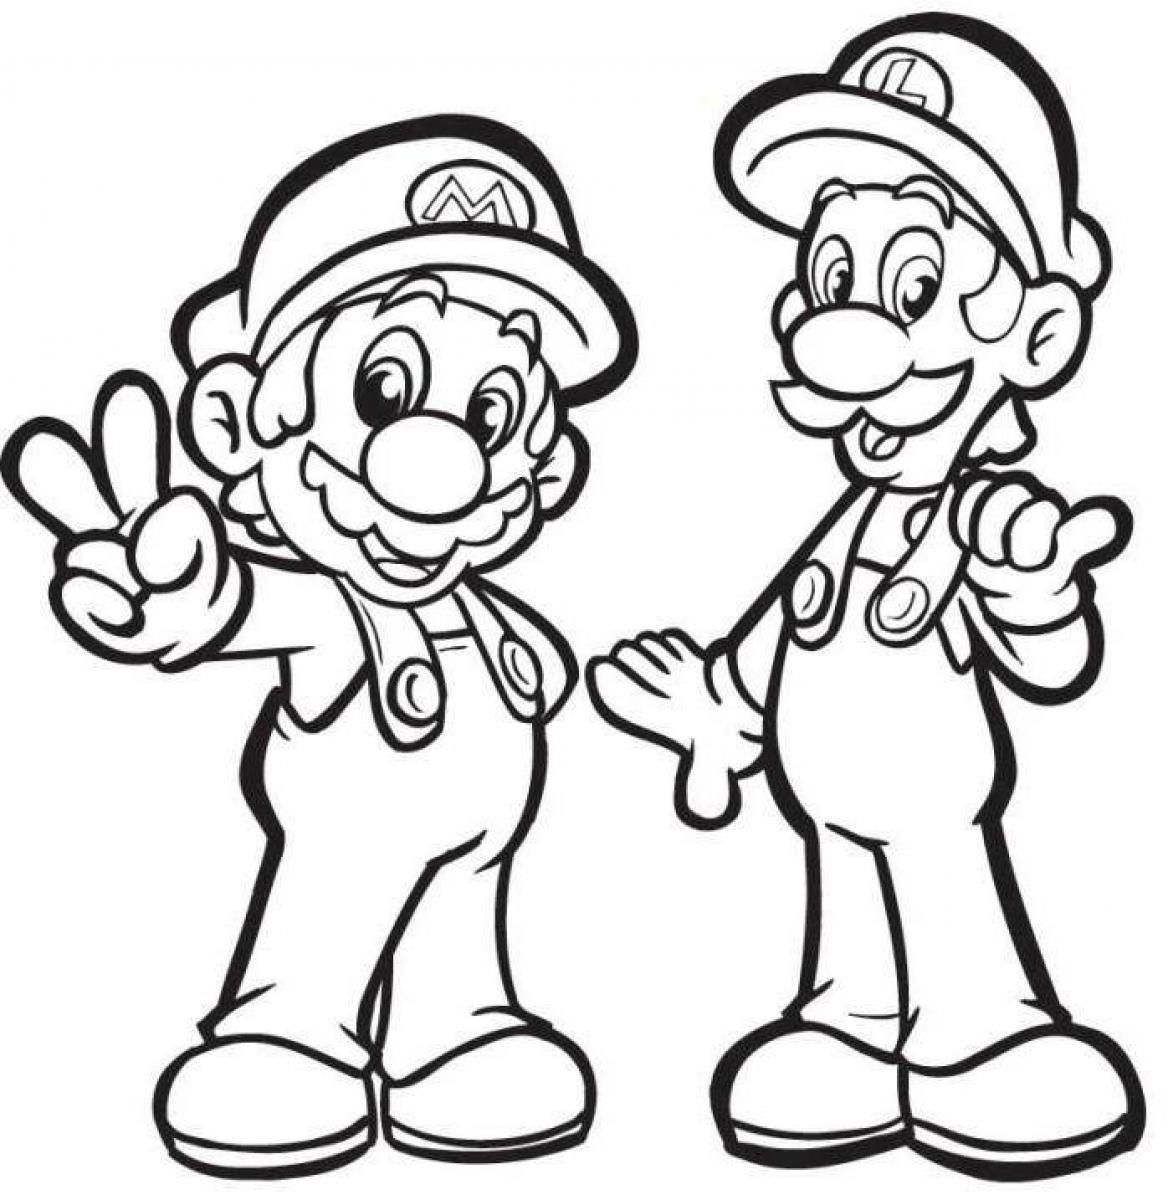 Luigi coloring pages printable luigi coloring pages free luigi coloring pages online luigi